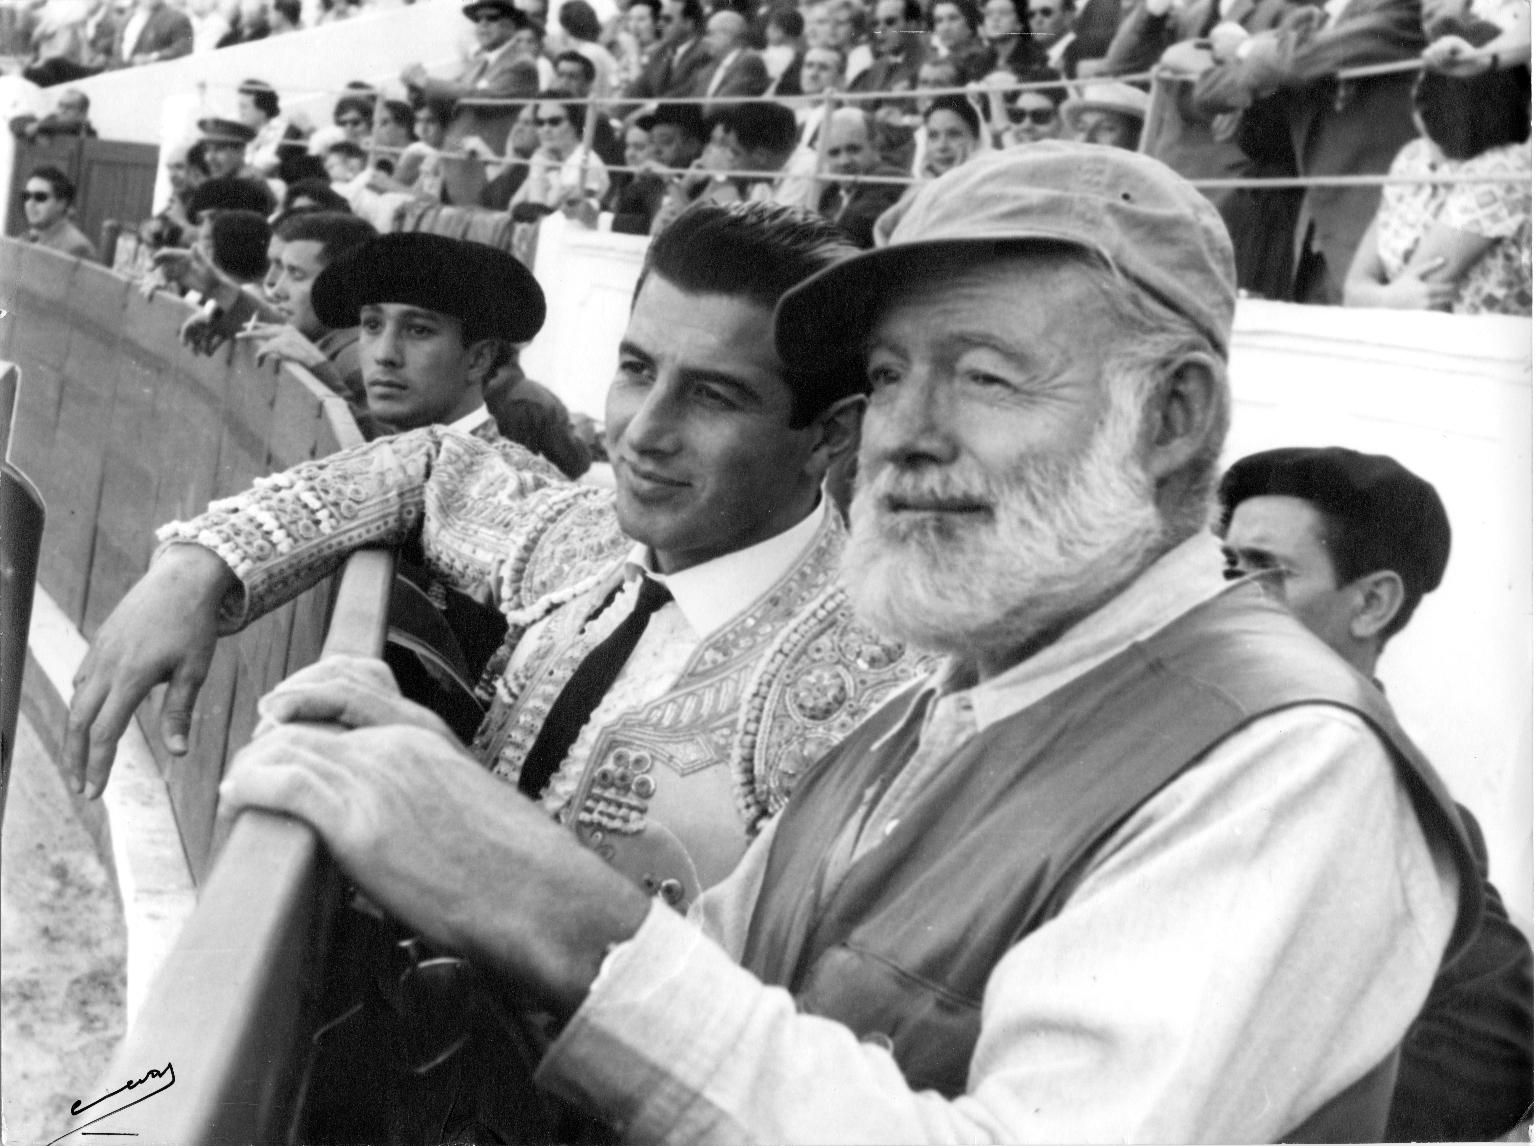 Ernest Hemingway and Antonio Ordonez at Bullfight